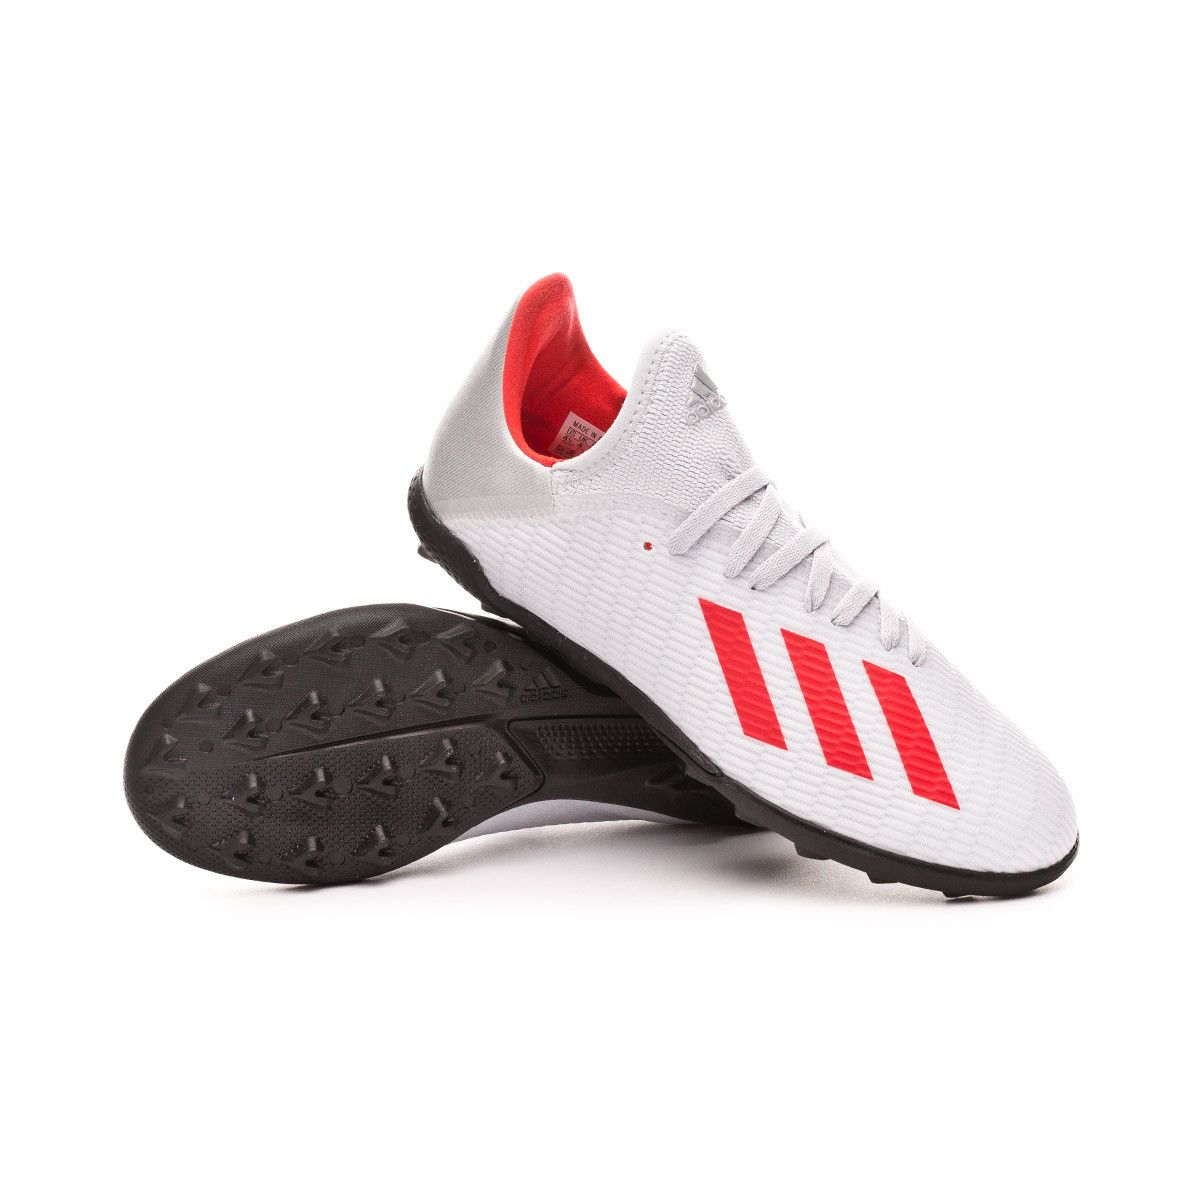 Zapatilla adidas X 19.3 Turf Niño | NIÑO | Botas de fútbol